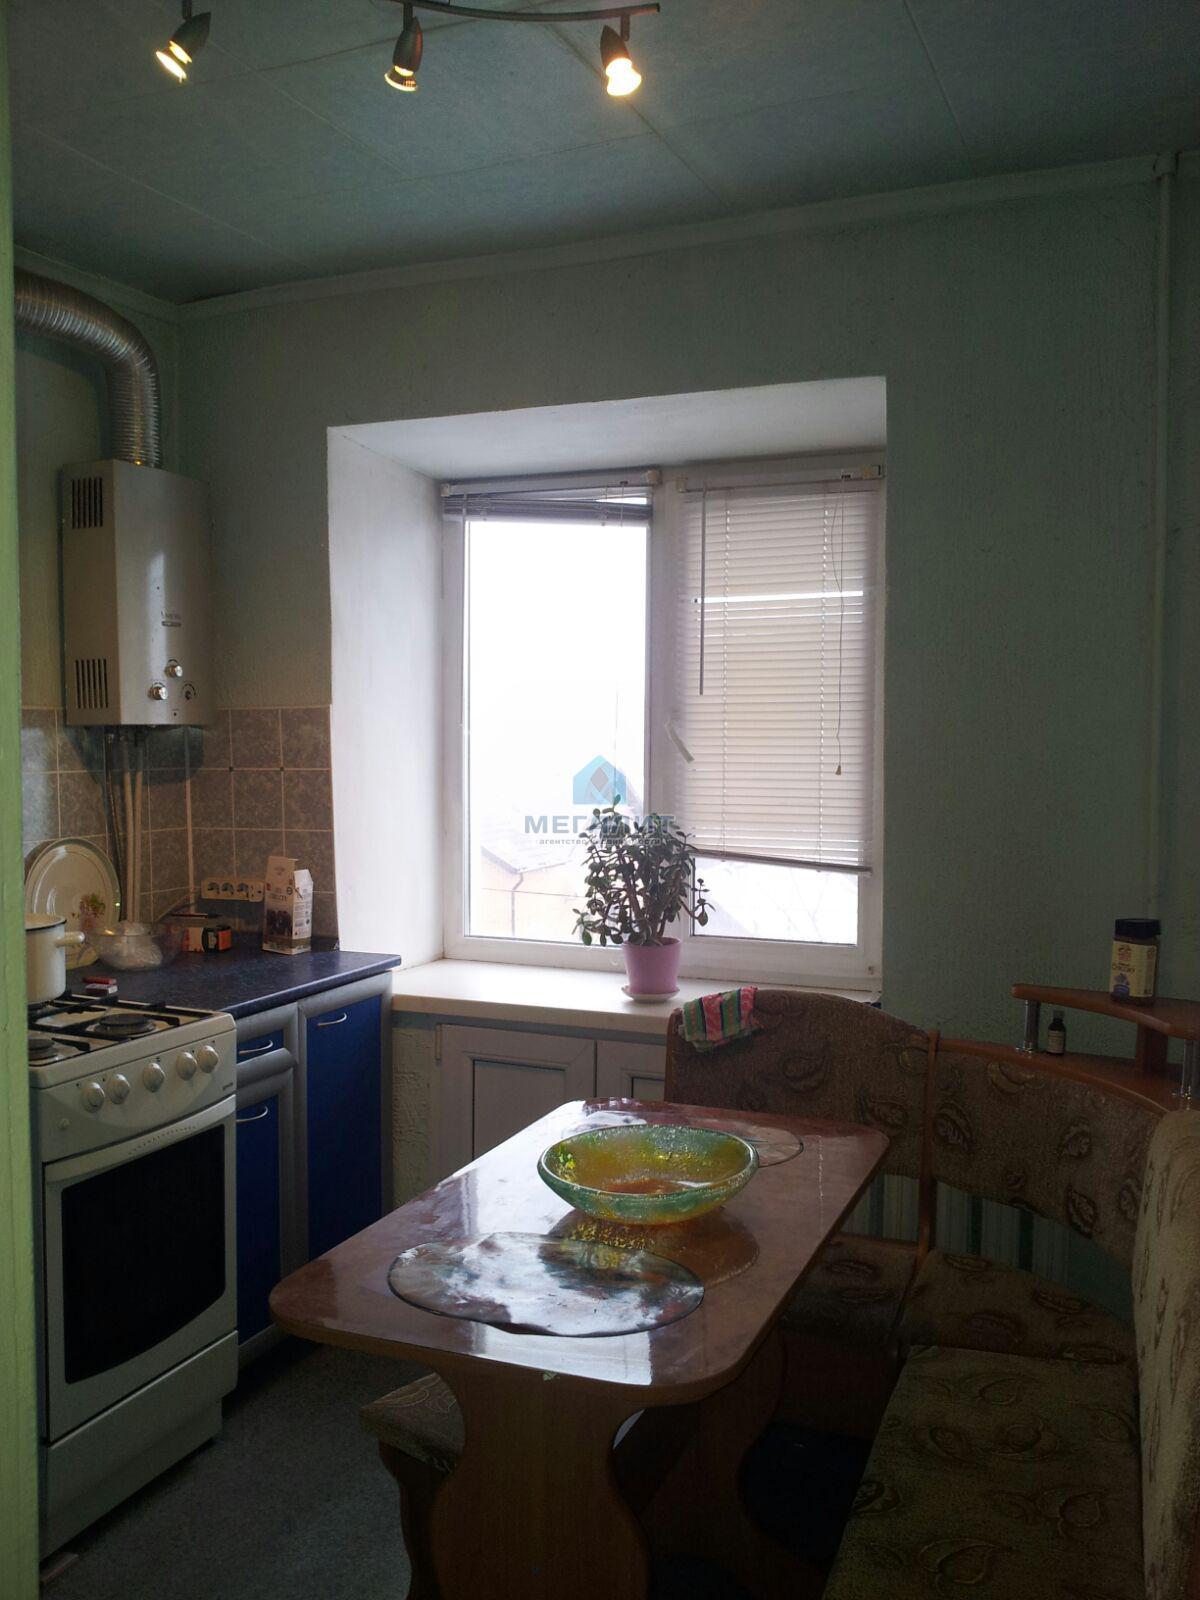 Аренда 2-к квартиры Краснооктябрьская 17, 45.0 м² (миниатюра №3)